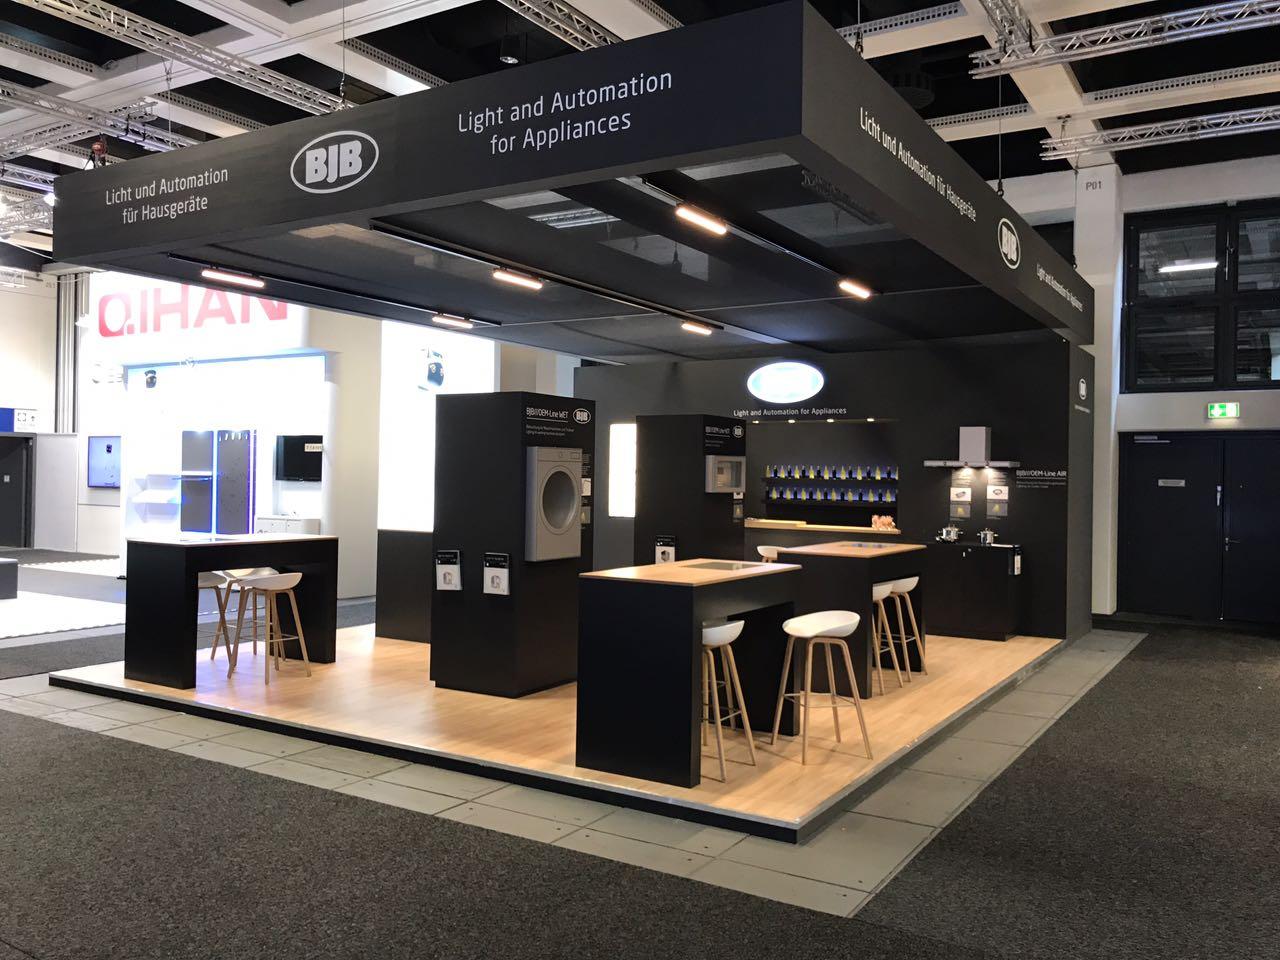 fairconstruction mdl expo international gmbh kunde bjb auf der ifa 2017 in berlin. Black Bedroom Furniture Sets. Home Design Ideas